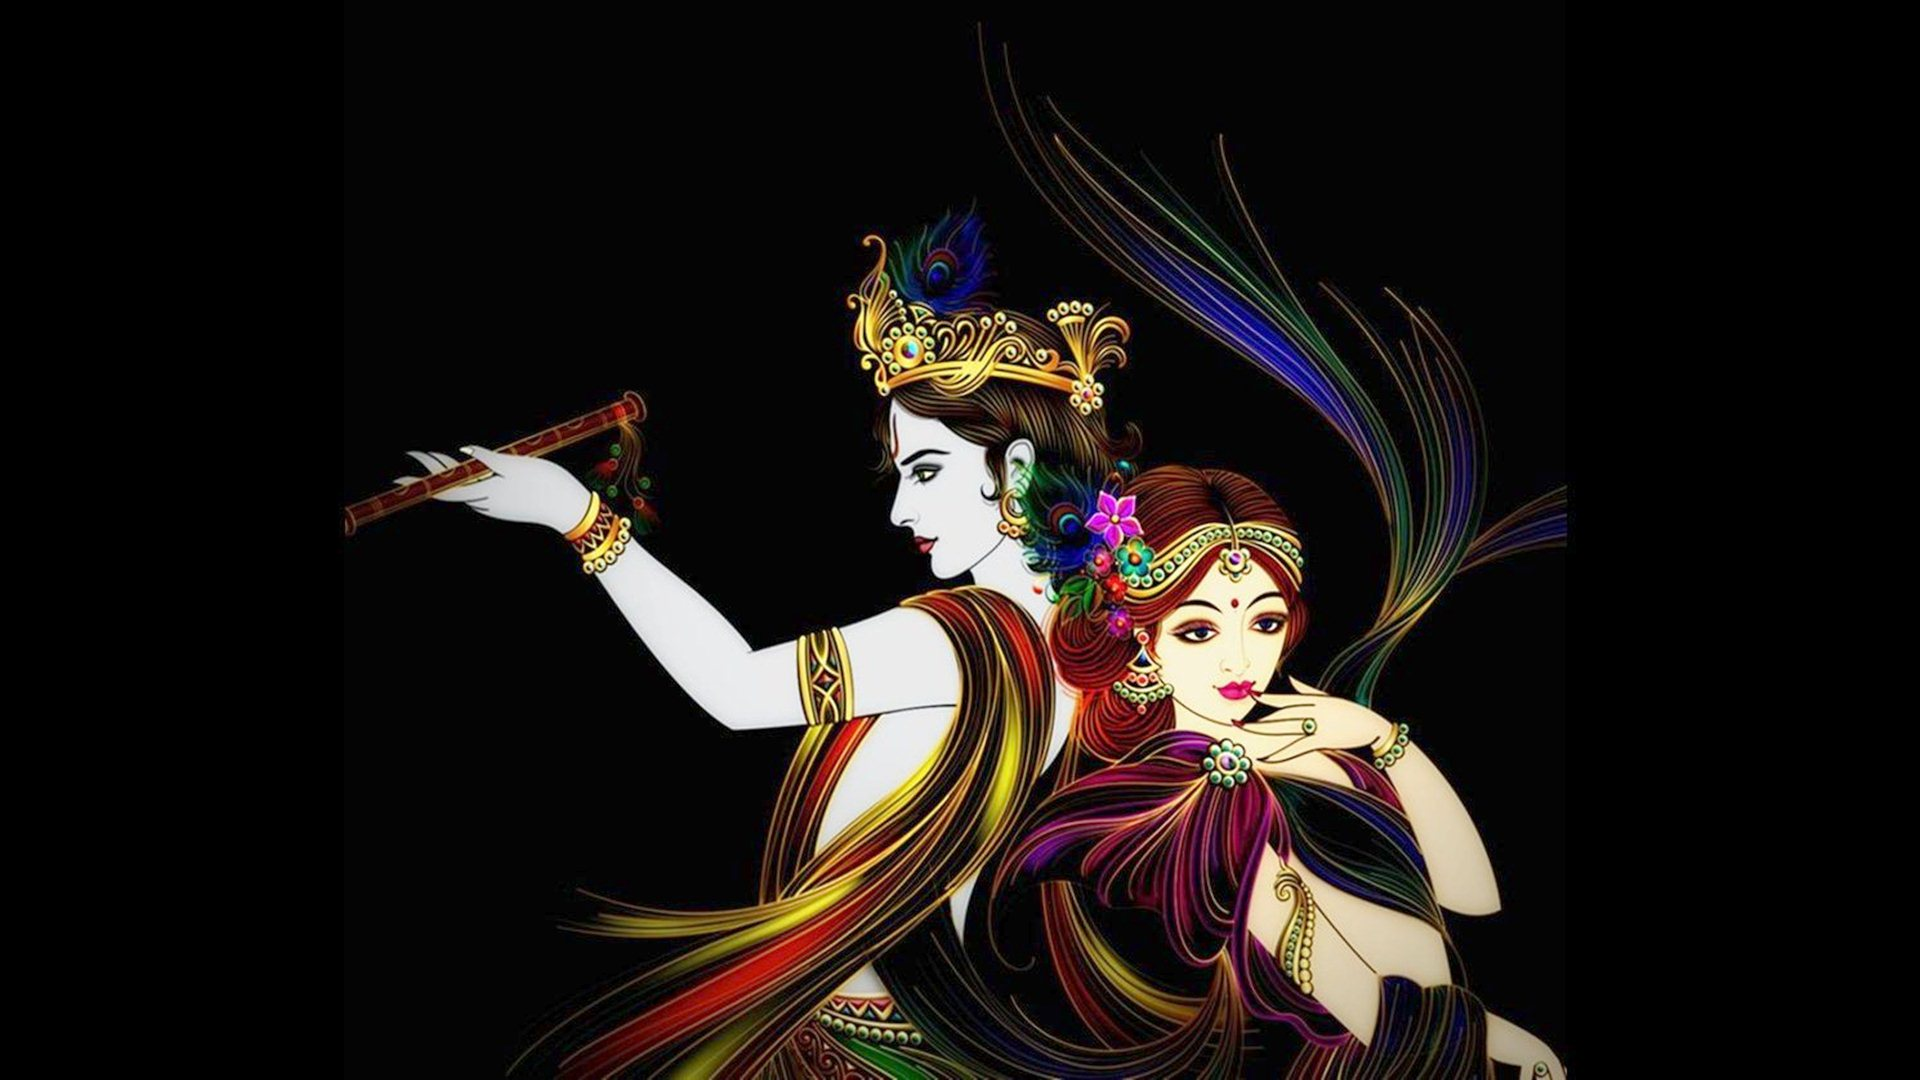 Radha Krishna Images Radhe Krishna Wallpapers Radha Krishna Images Hd Radha Krishna Photos Radha Krishna Hd Wallpaper